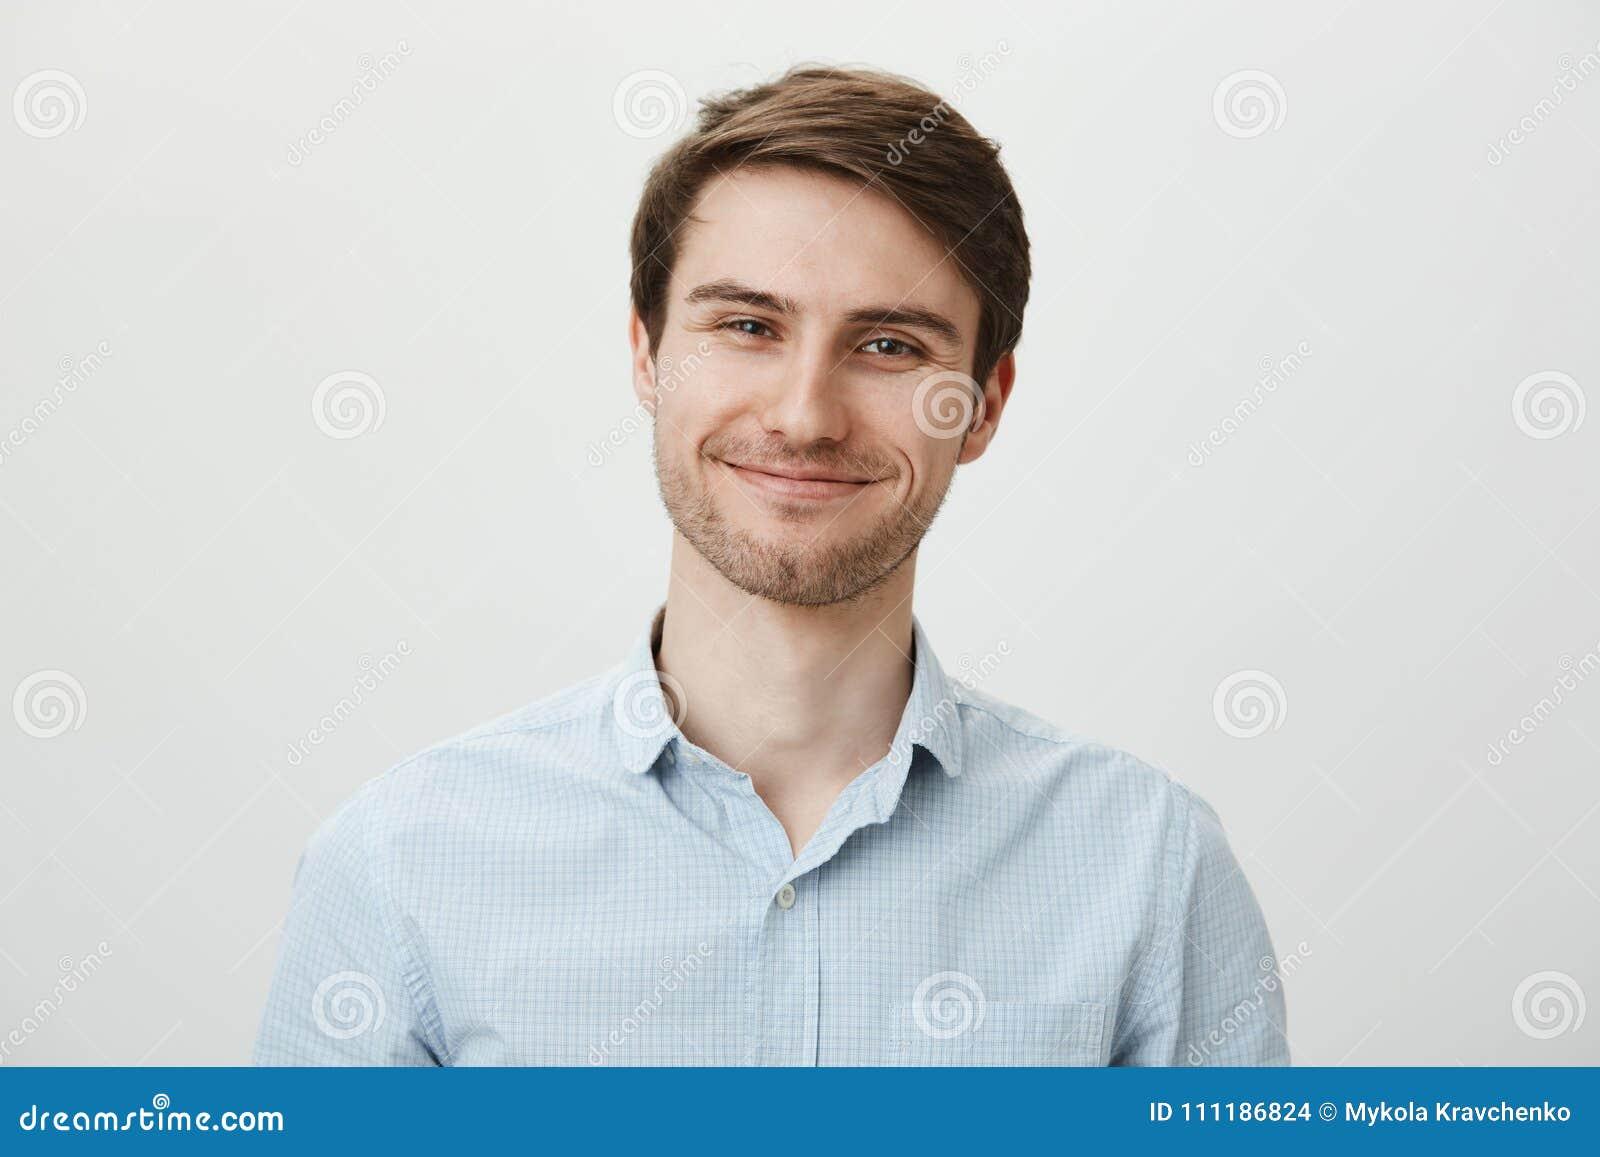 Houd sprekend maar ik geef niet Portret van beleefde gehinderde aantrekkelijke beambte in toevallig overhemd die valse glimlach t